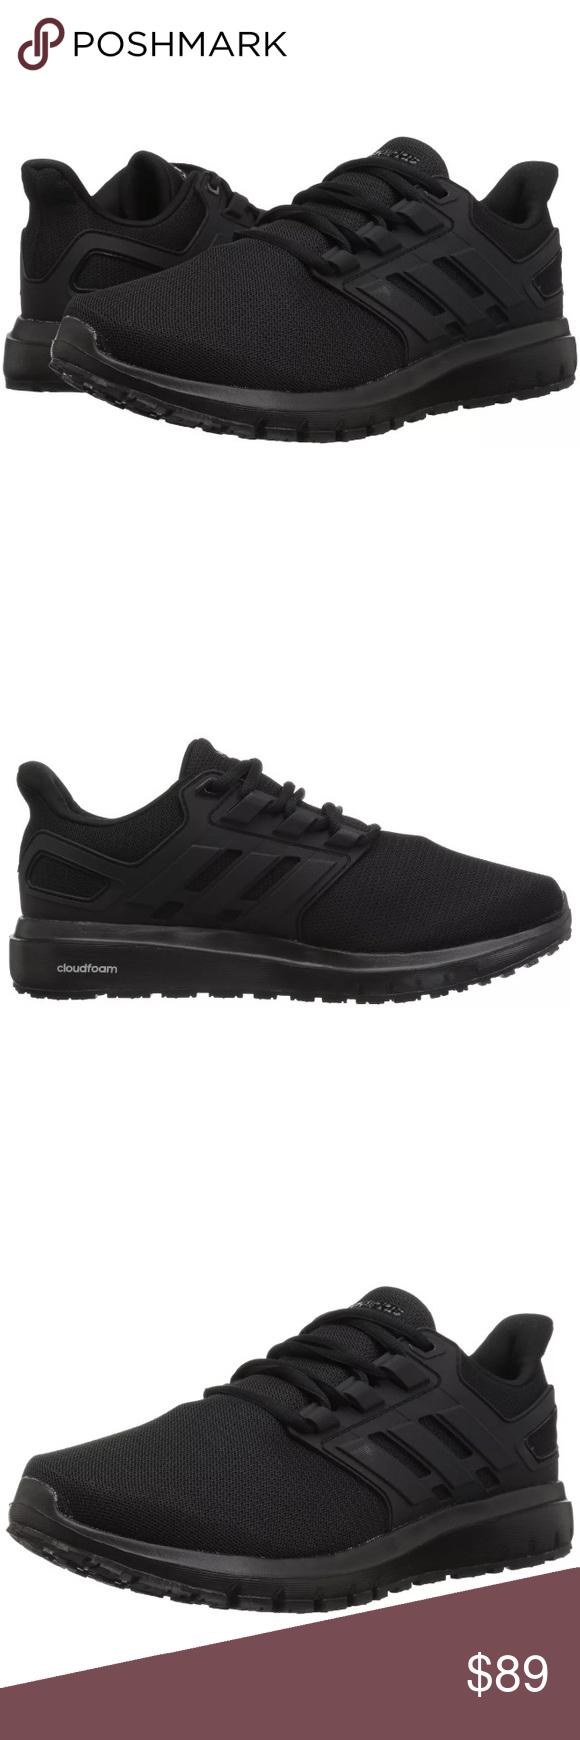 Adidas Energy Cloud 2 12 Wide Black Black Run Nwt Adidas Adidas Men Black Adidas